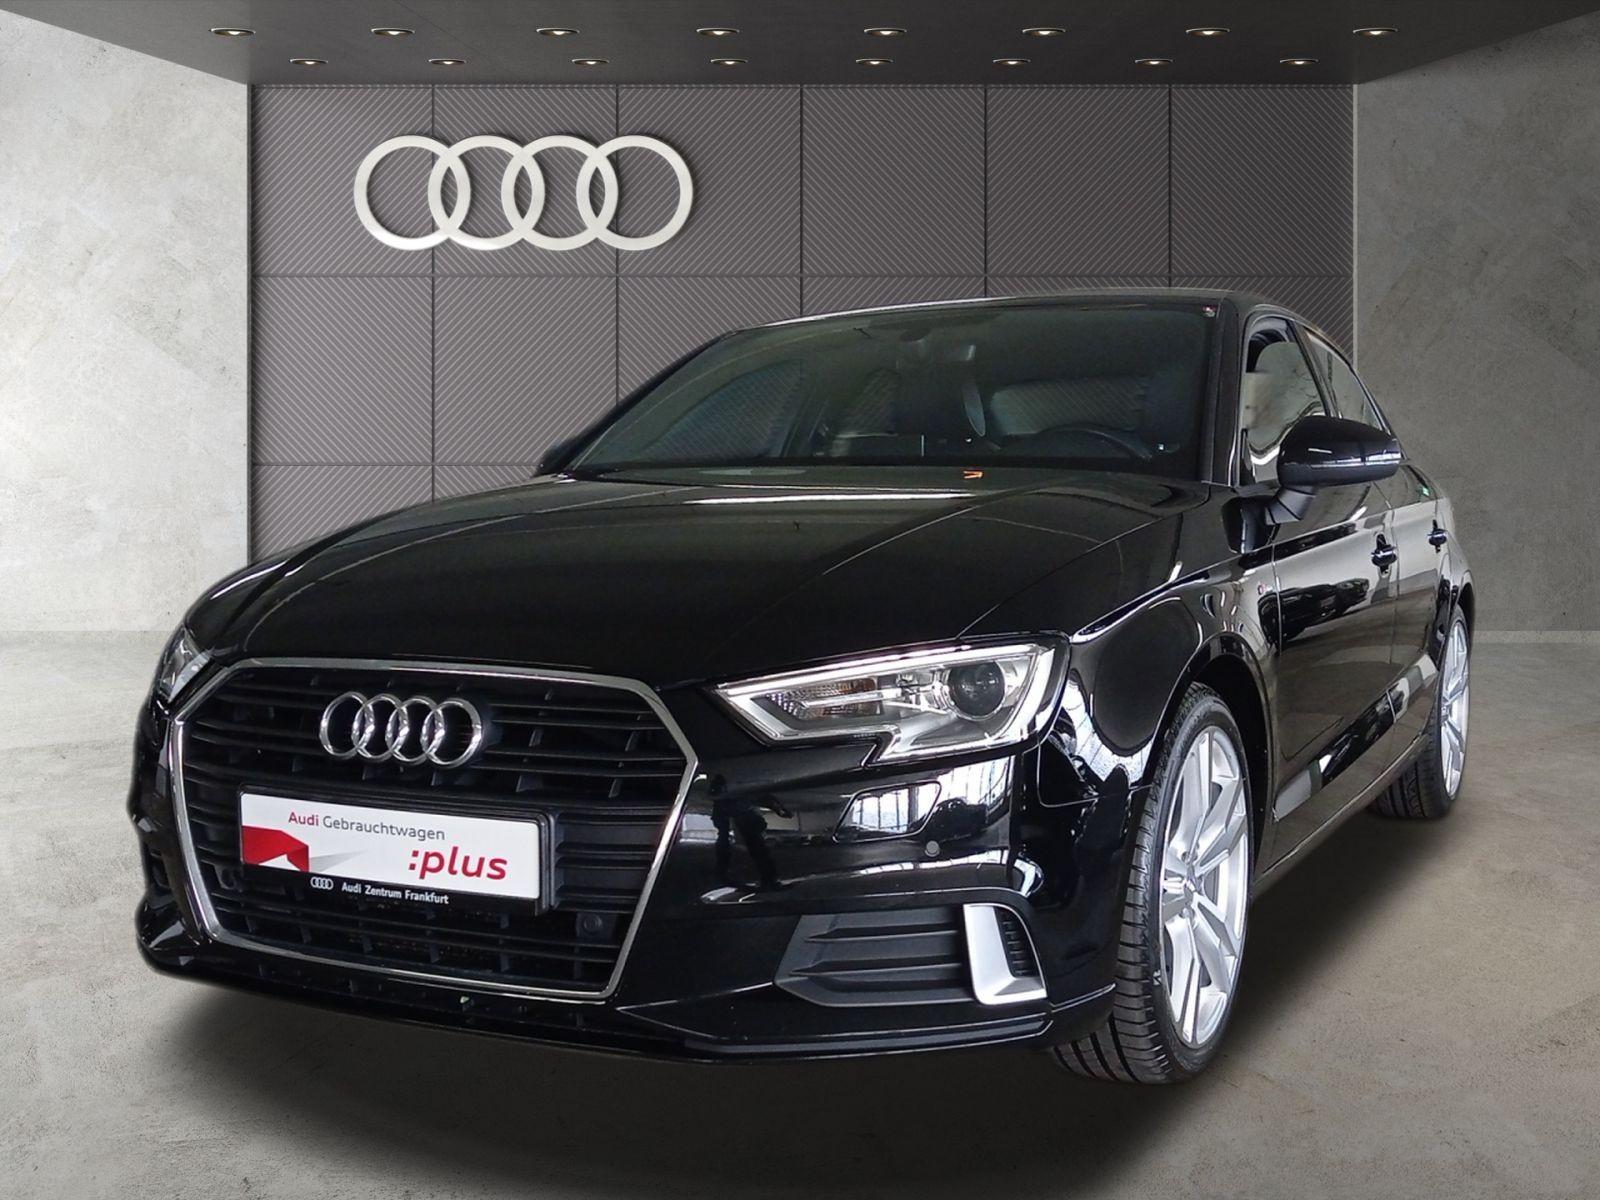 Audi A3 Limousine 1.0 TFSI S Line S tronic Navi Xenon PDC Sitzheizung, Jahr 2018, Benzin